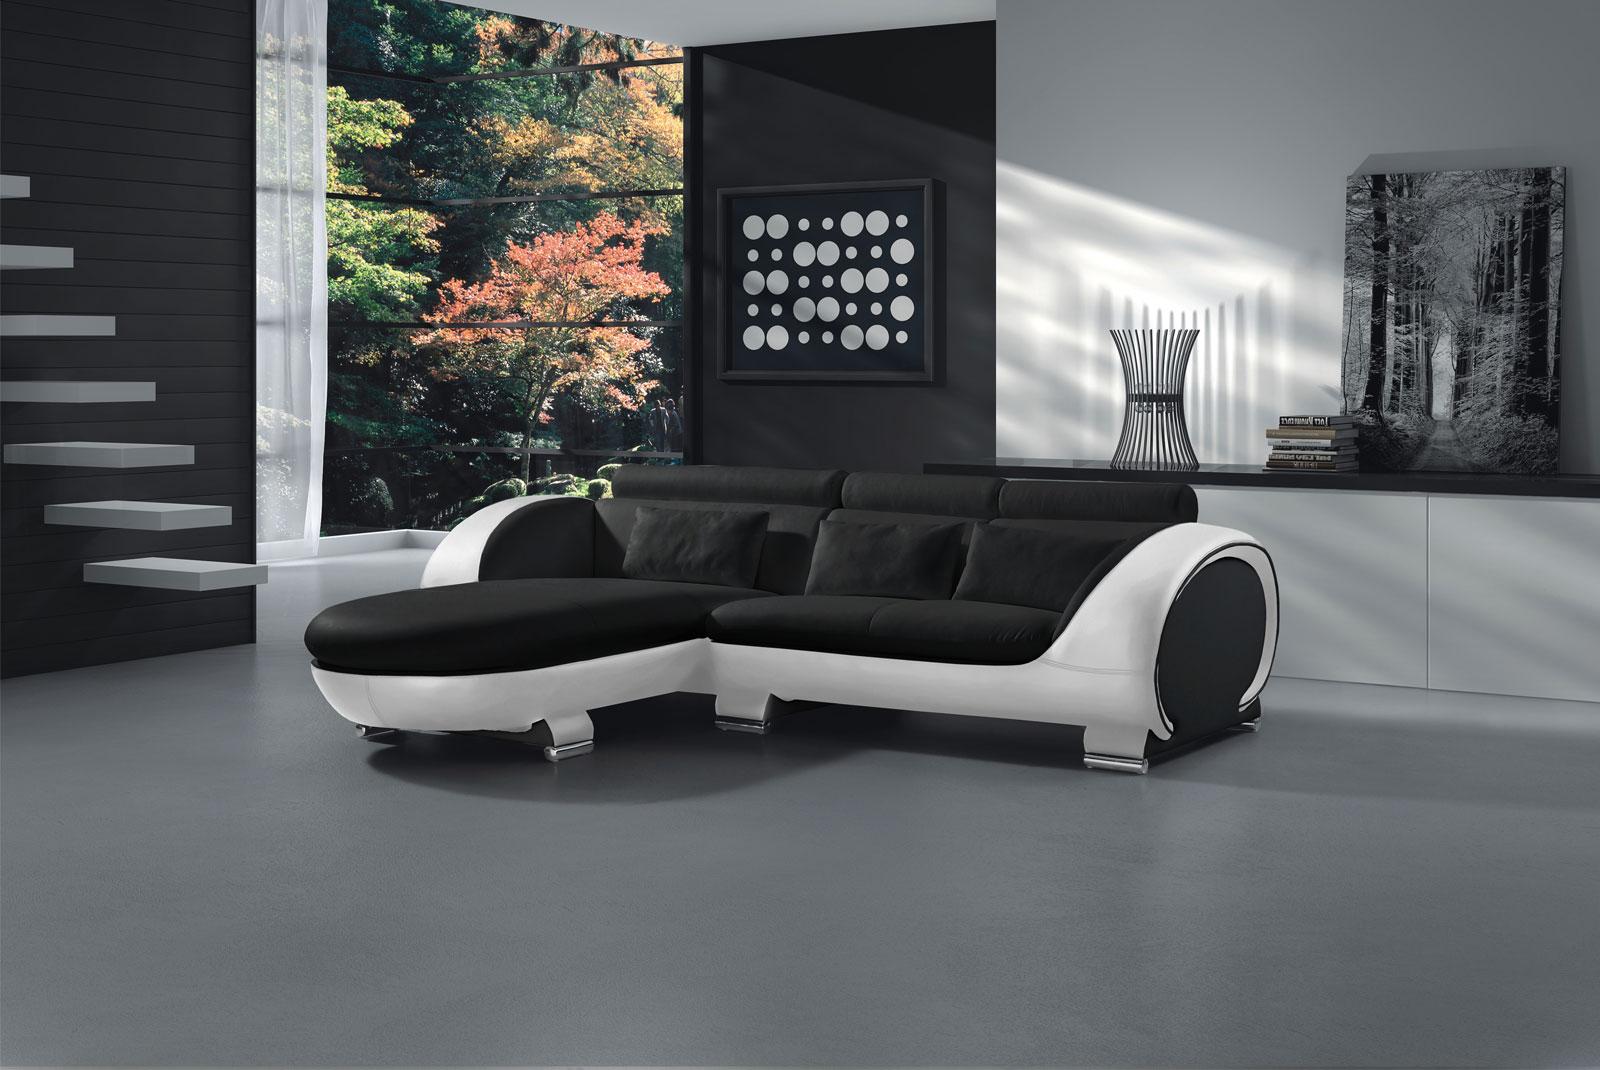 sam sofa schwarz wei vigo combi 1 couch 181 x 242 cm auf. Black Bedroom Furniture Sets. Home Design Ideas